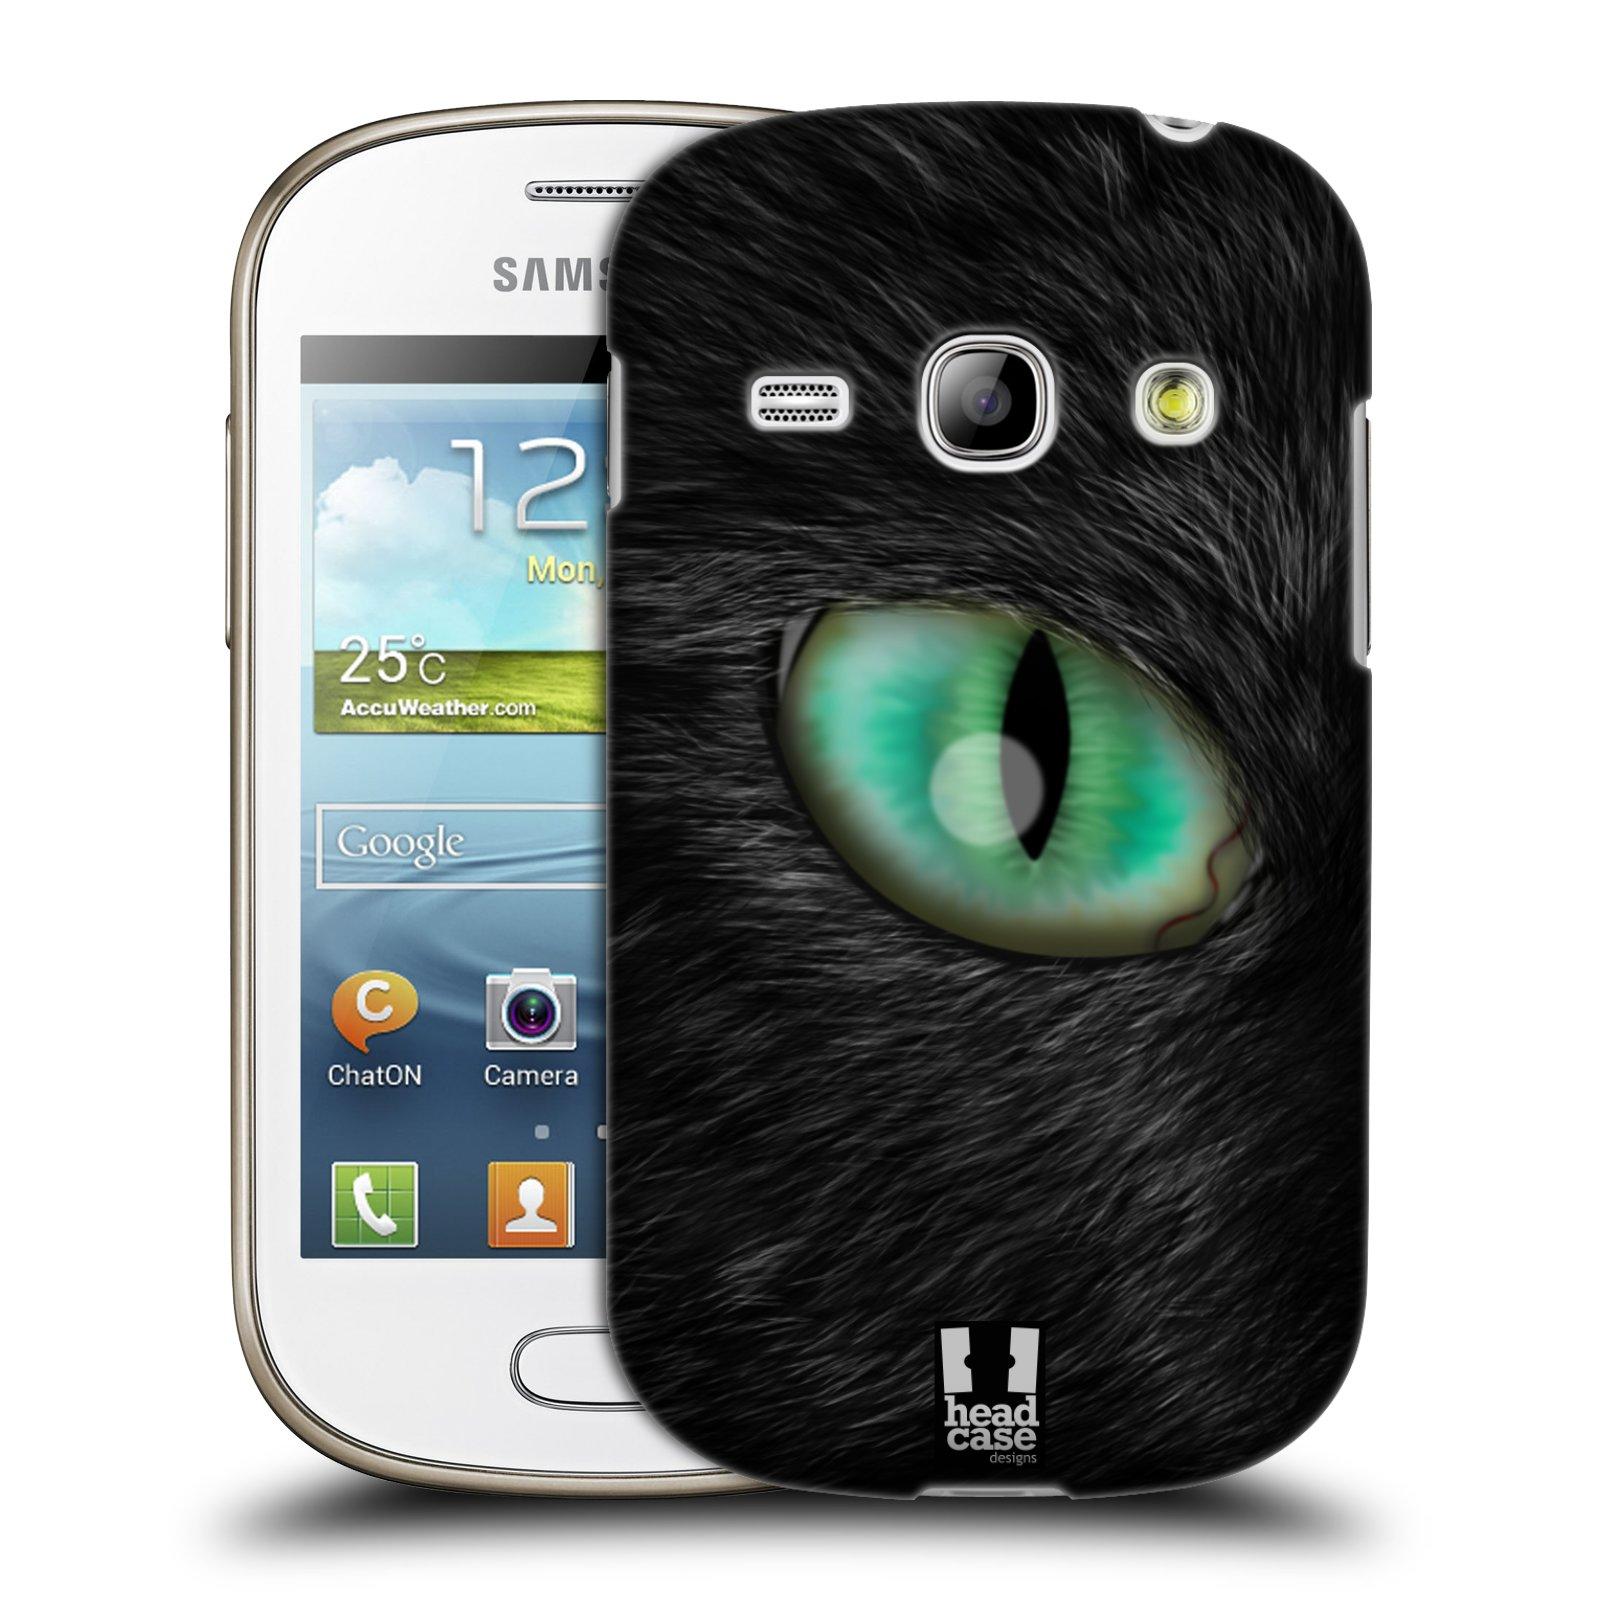 HEAD CASE plastový obal na mobil SAMSUNG GALAXY FAME (S6810) vzor pohled zvířete oko kočka